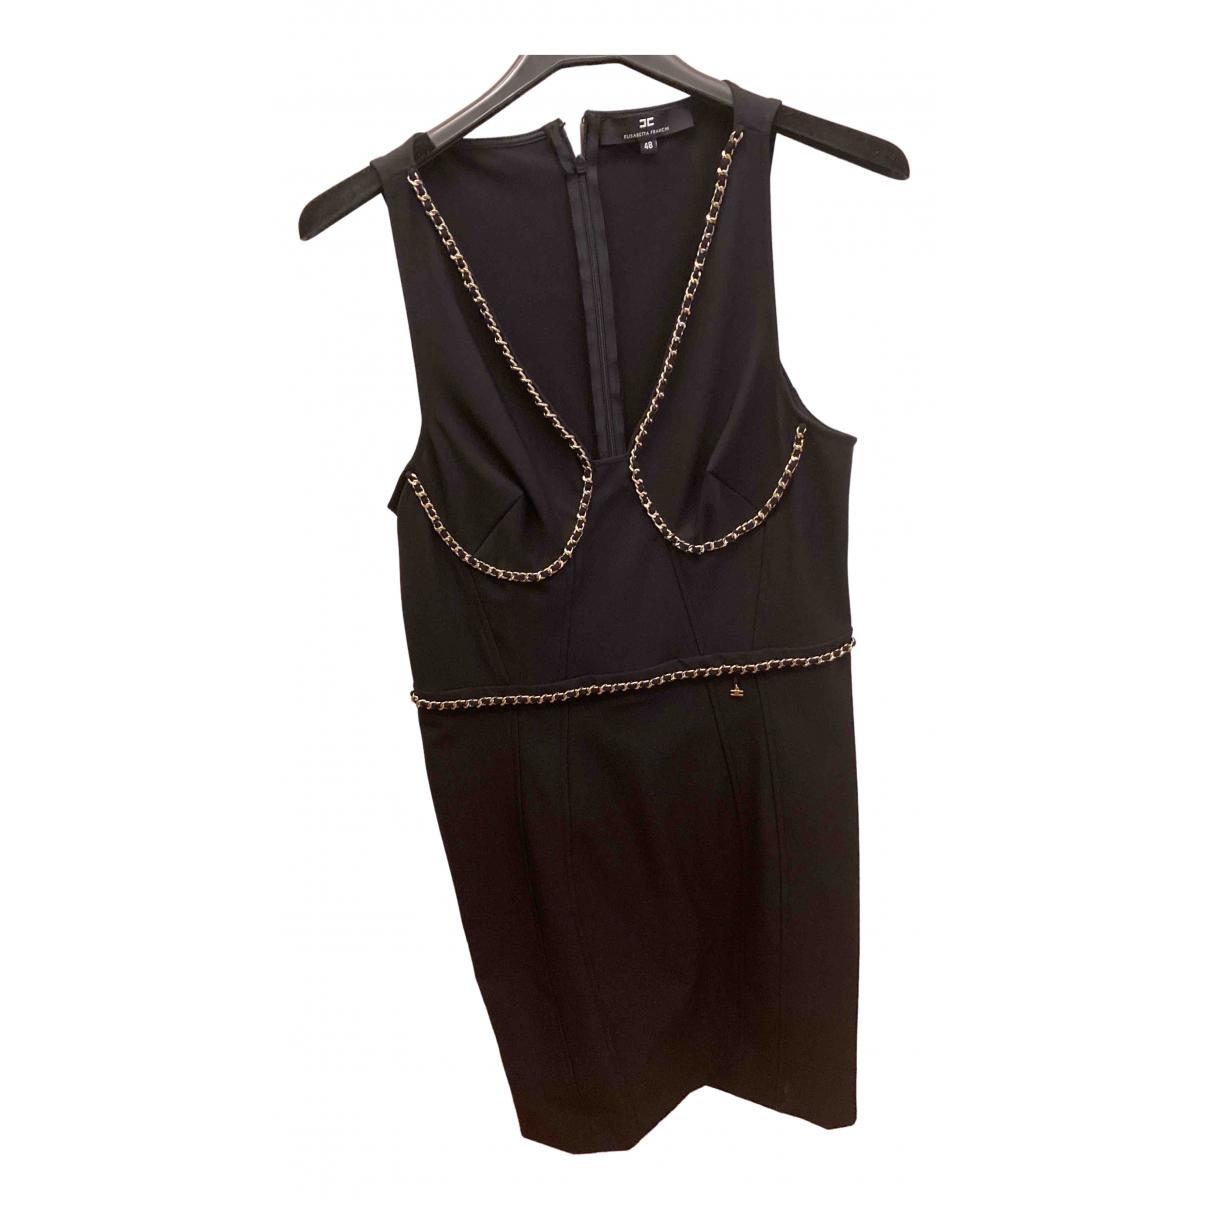 Elisabetta Franchi \N Black Cotton - elasthane dress for Women 48 IT